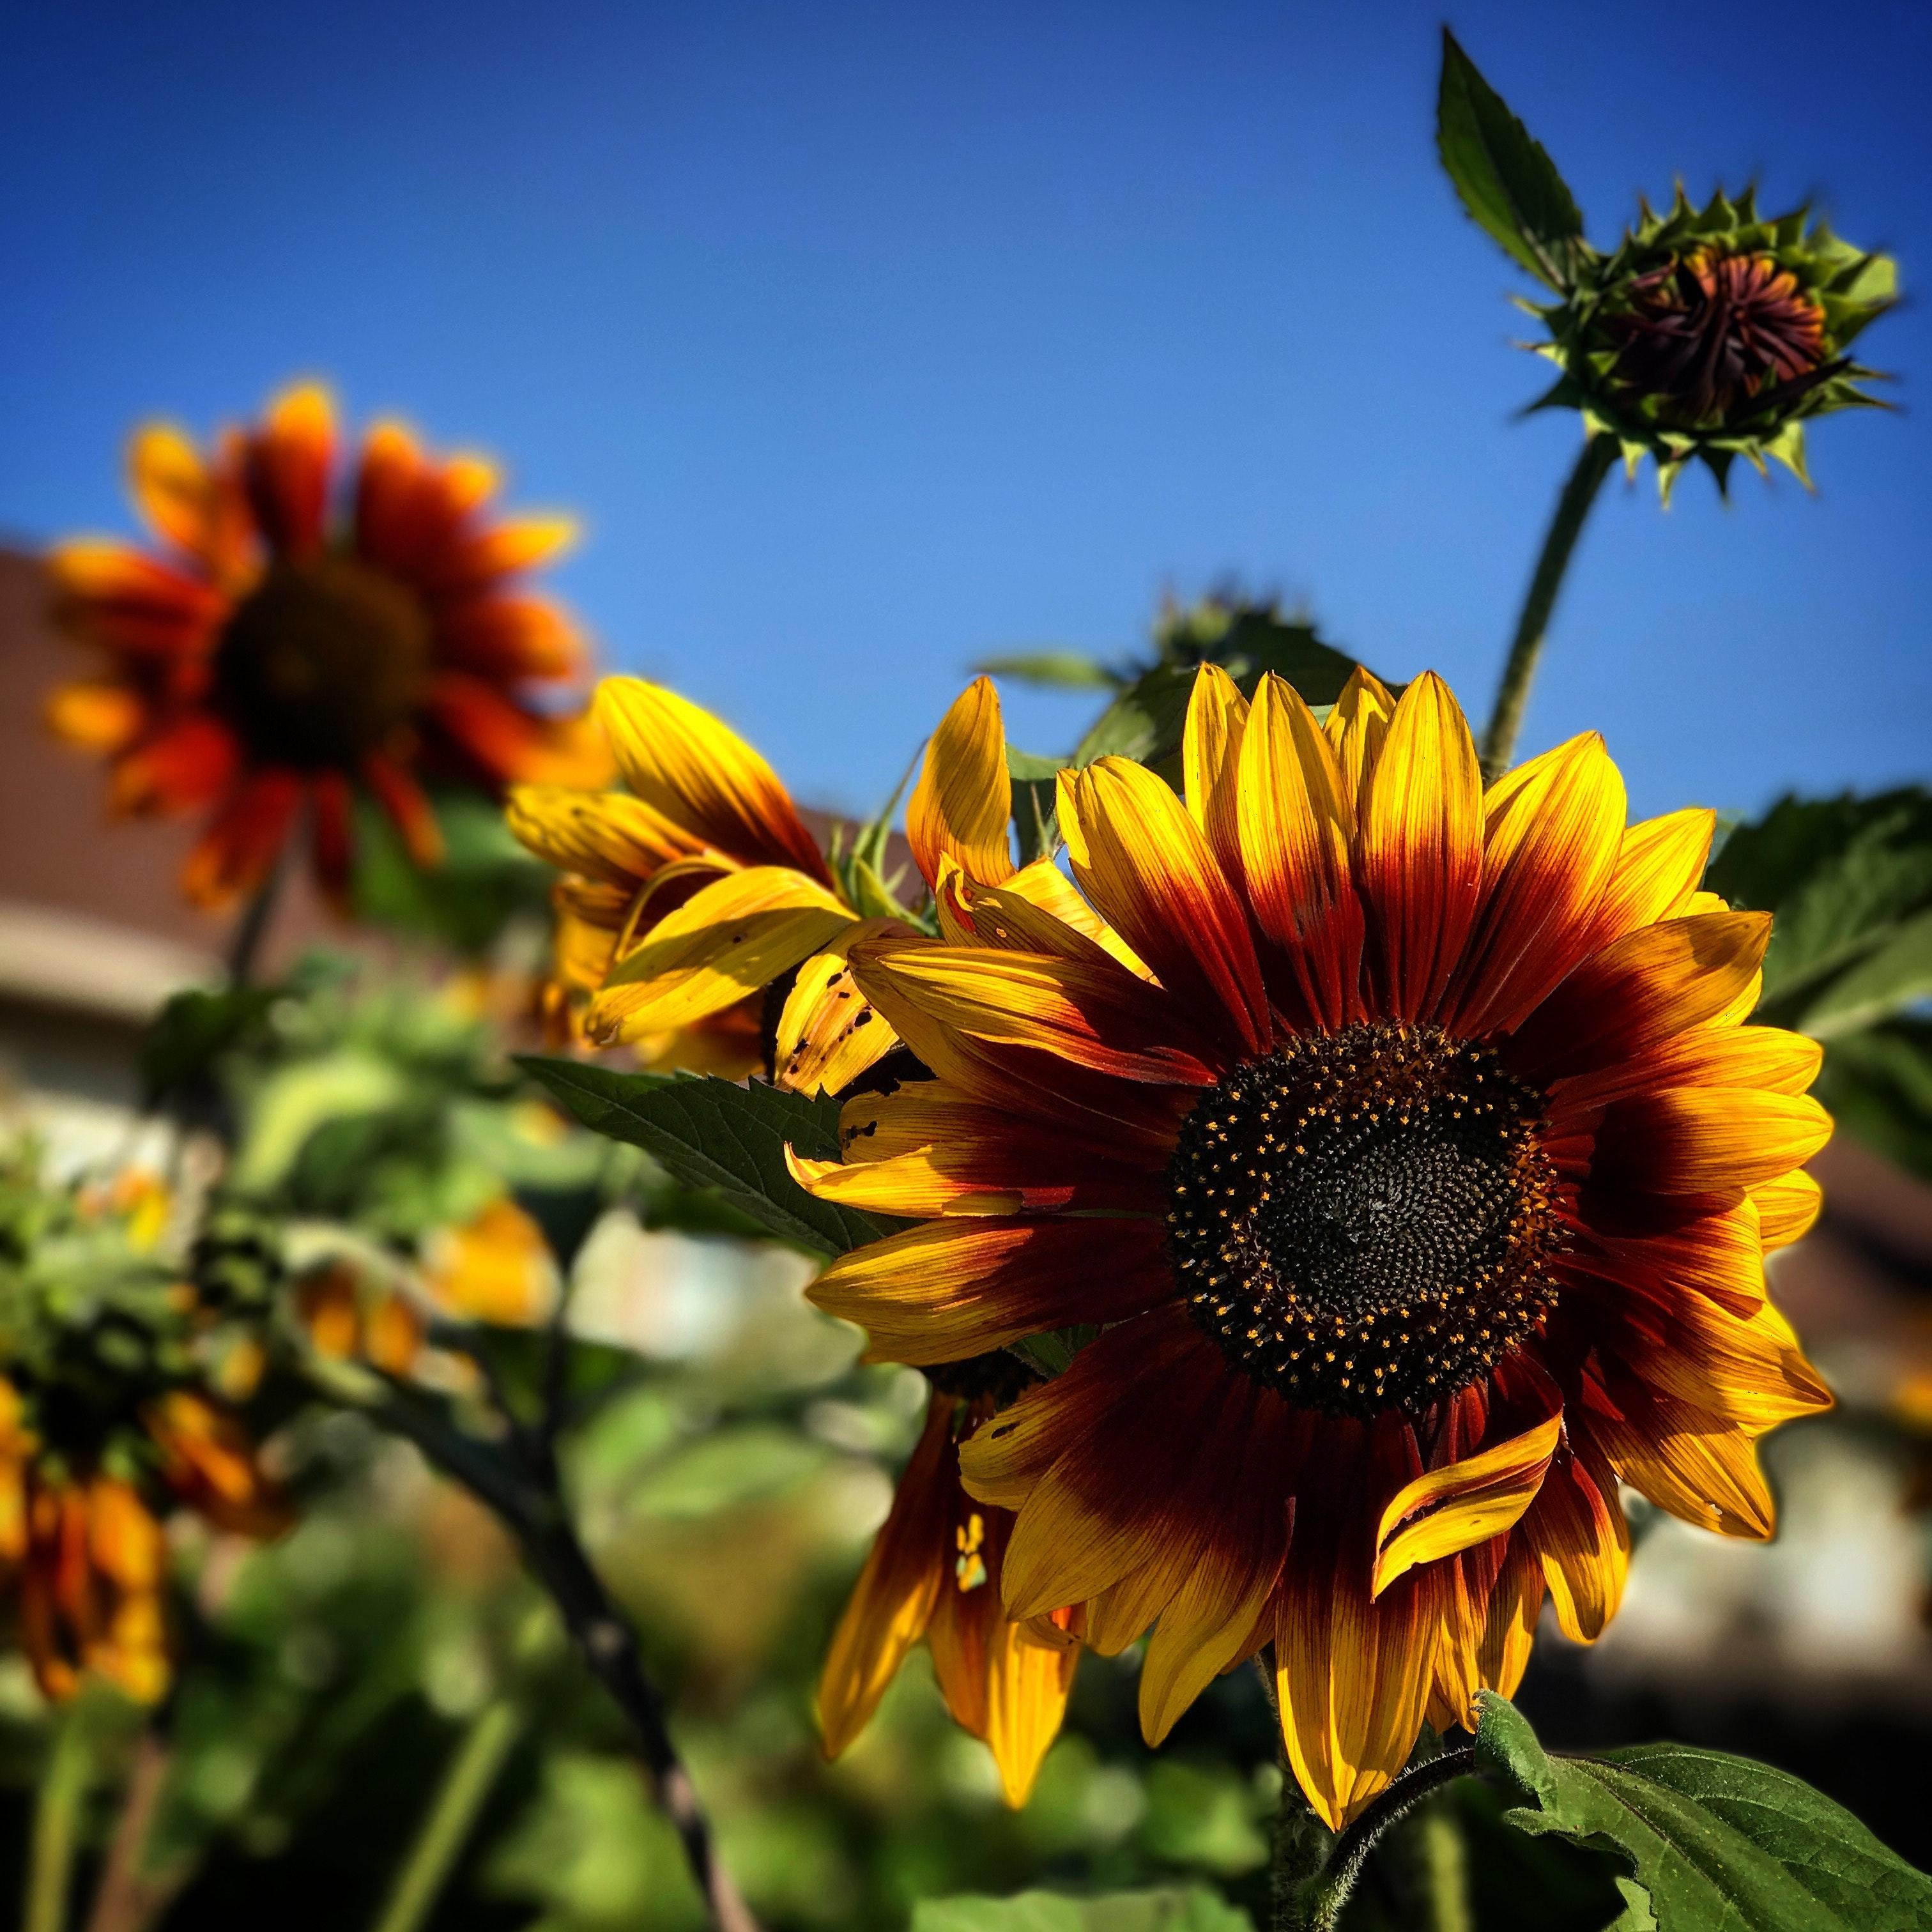 Gambar Bunga Matahari Tanaman Berbunga Langit Kuning Menanam Daun Bunga Bunga Liar Serbuk Sari Makanan Vegetarian Keluarga Daisy Asterales Biji Bunga Matahari Tanaman Tahunan Masakan Tanaman Abadi 3024x3024 1507303 Galeri Foto